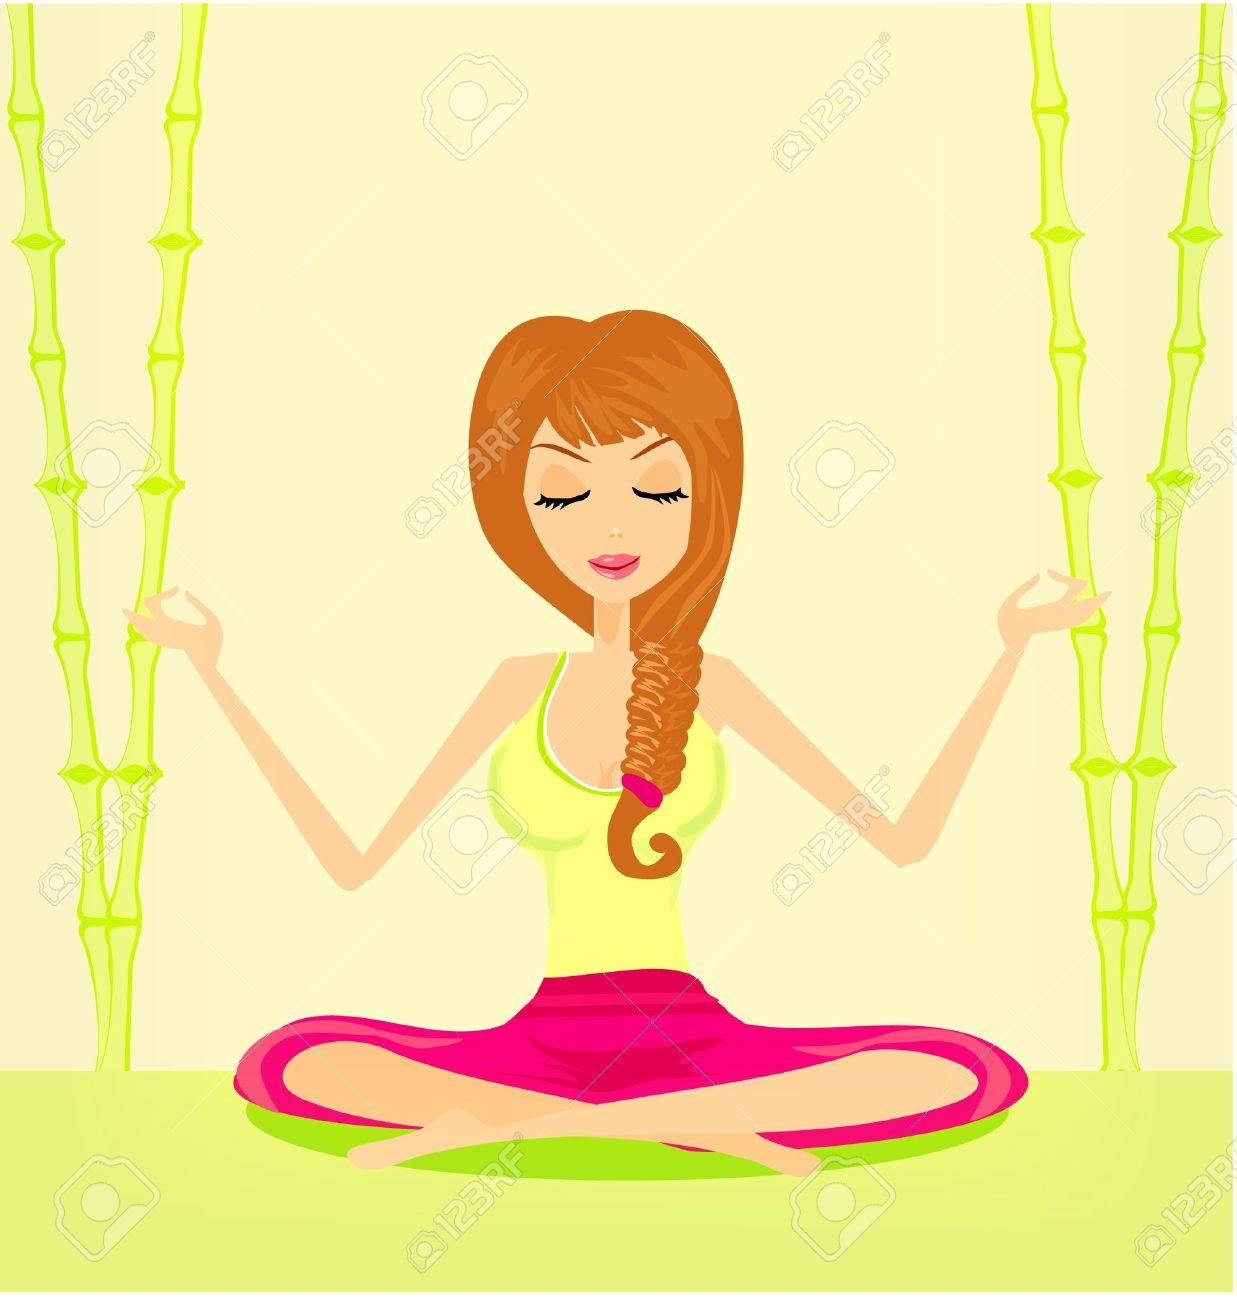 Girl relaxing clipart.